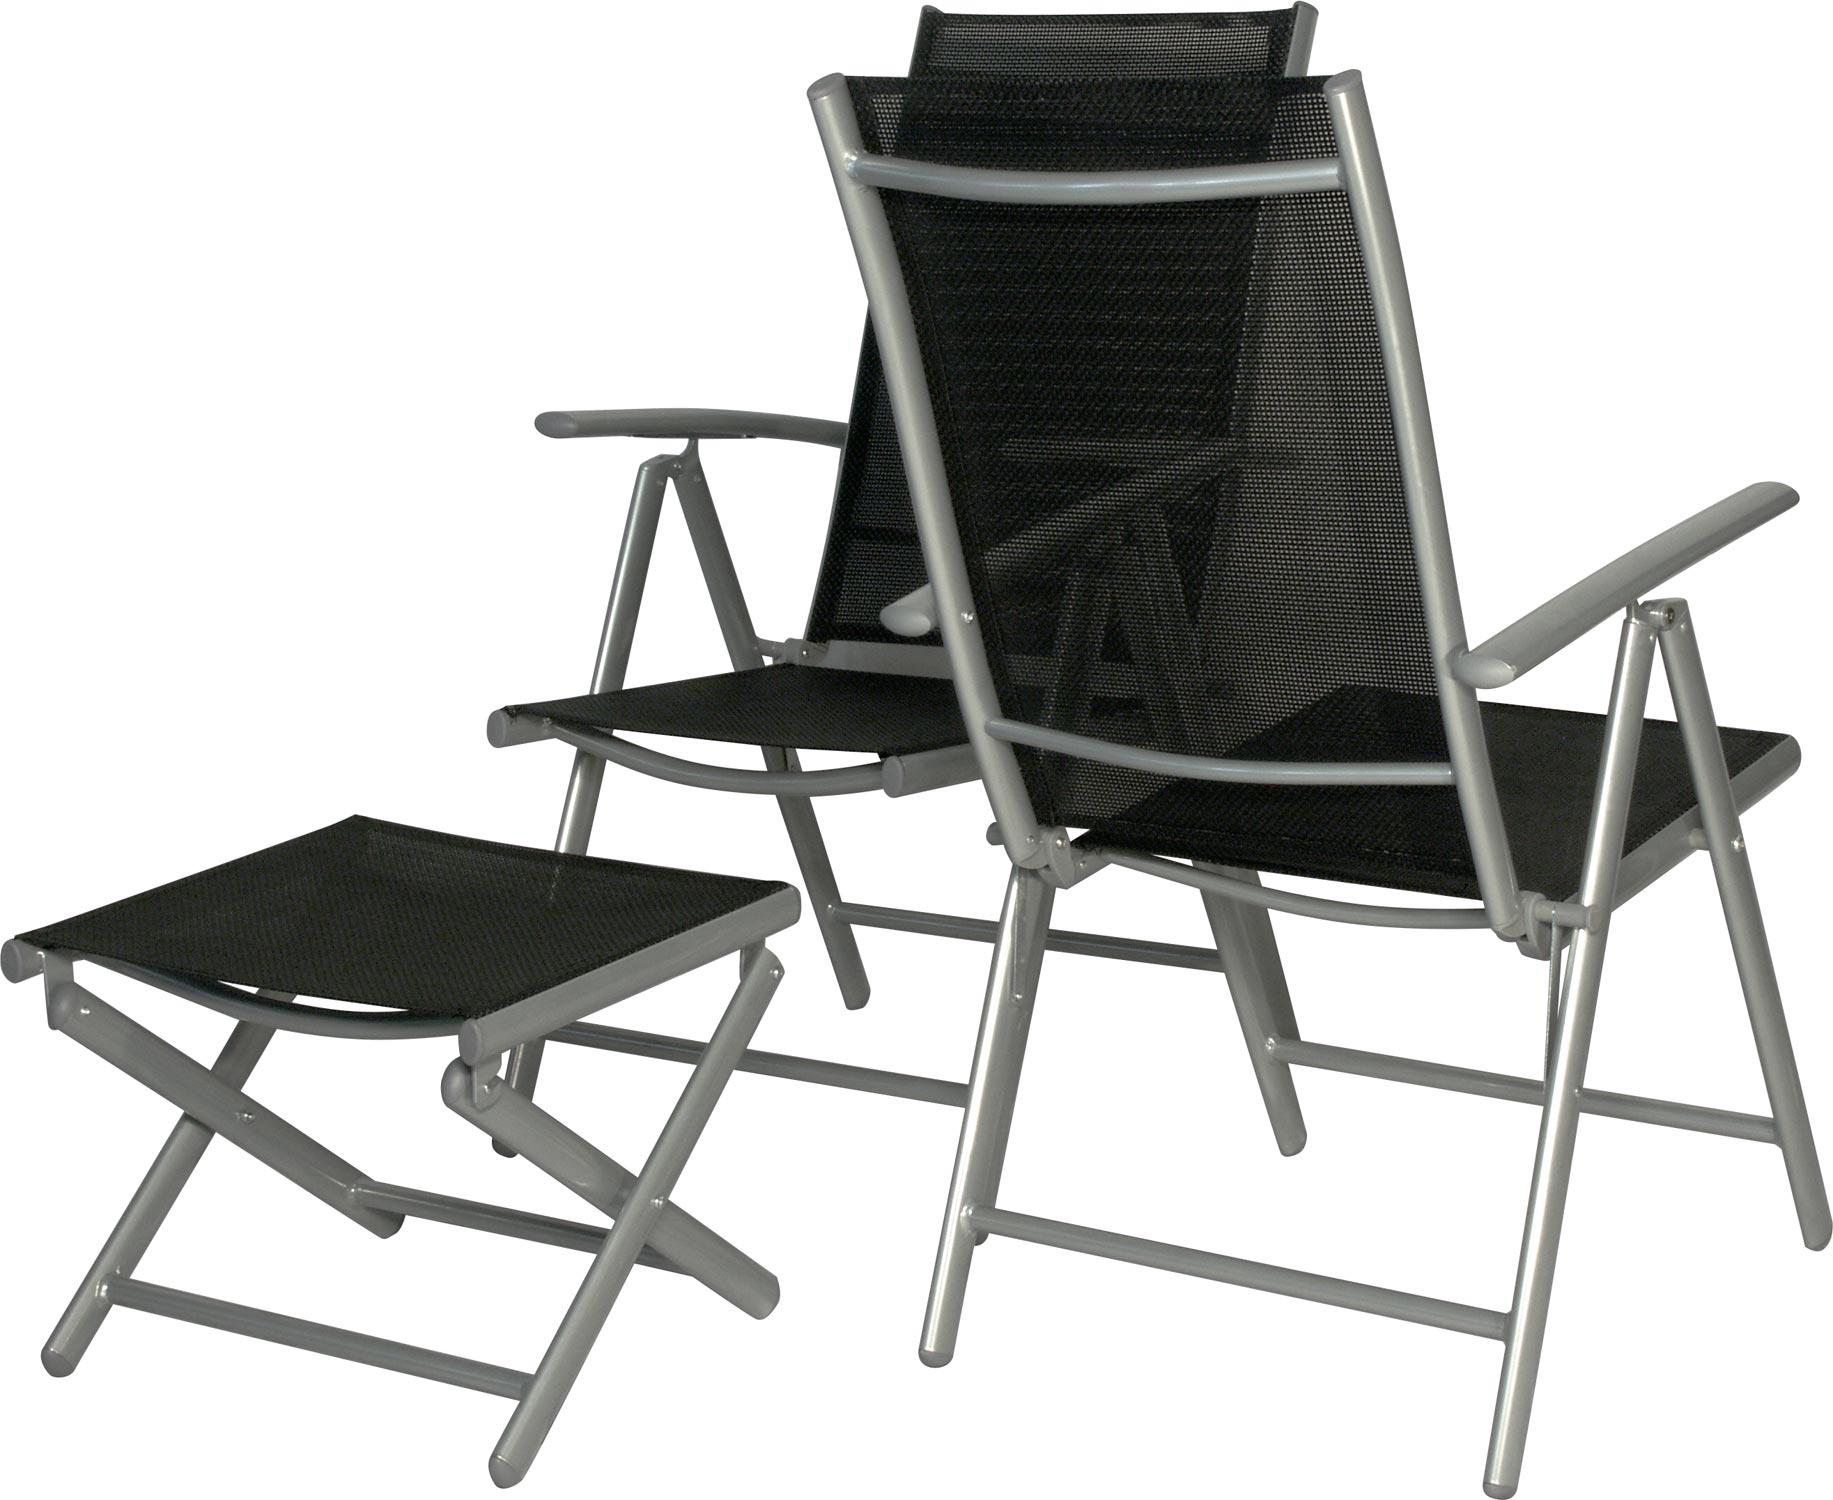 2 x hochlehner 2 x fussbank star alu schw klappsessel gartenstuhl gartenm bel ebay. Black Bedroom Furniture Sets. Home Design Ideas